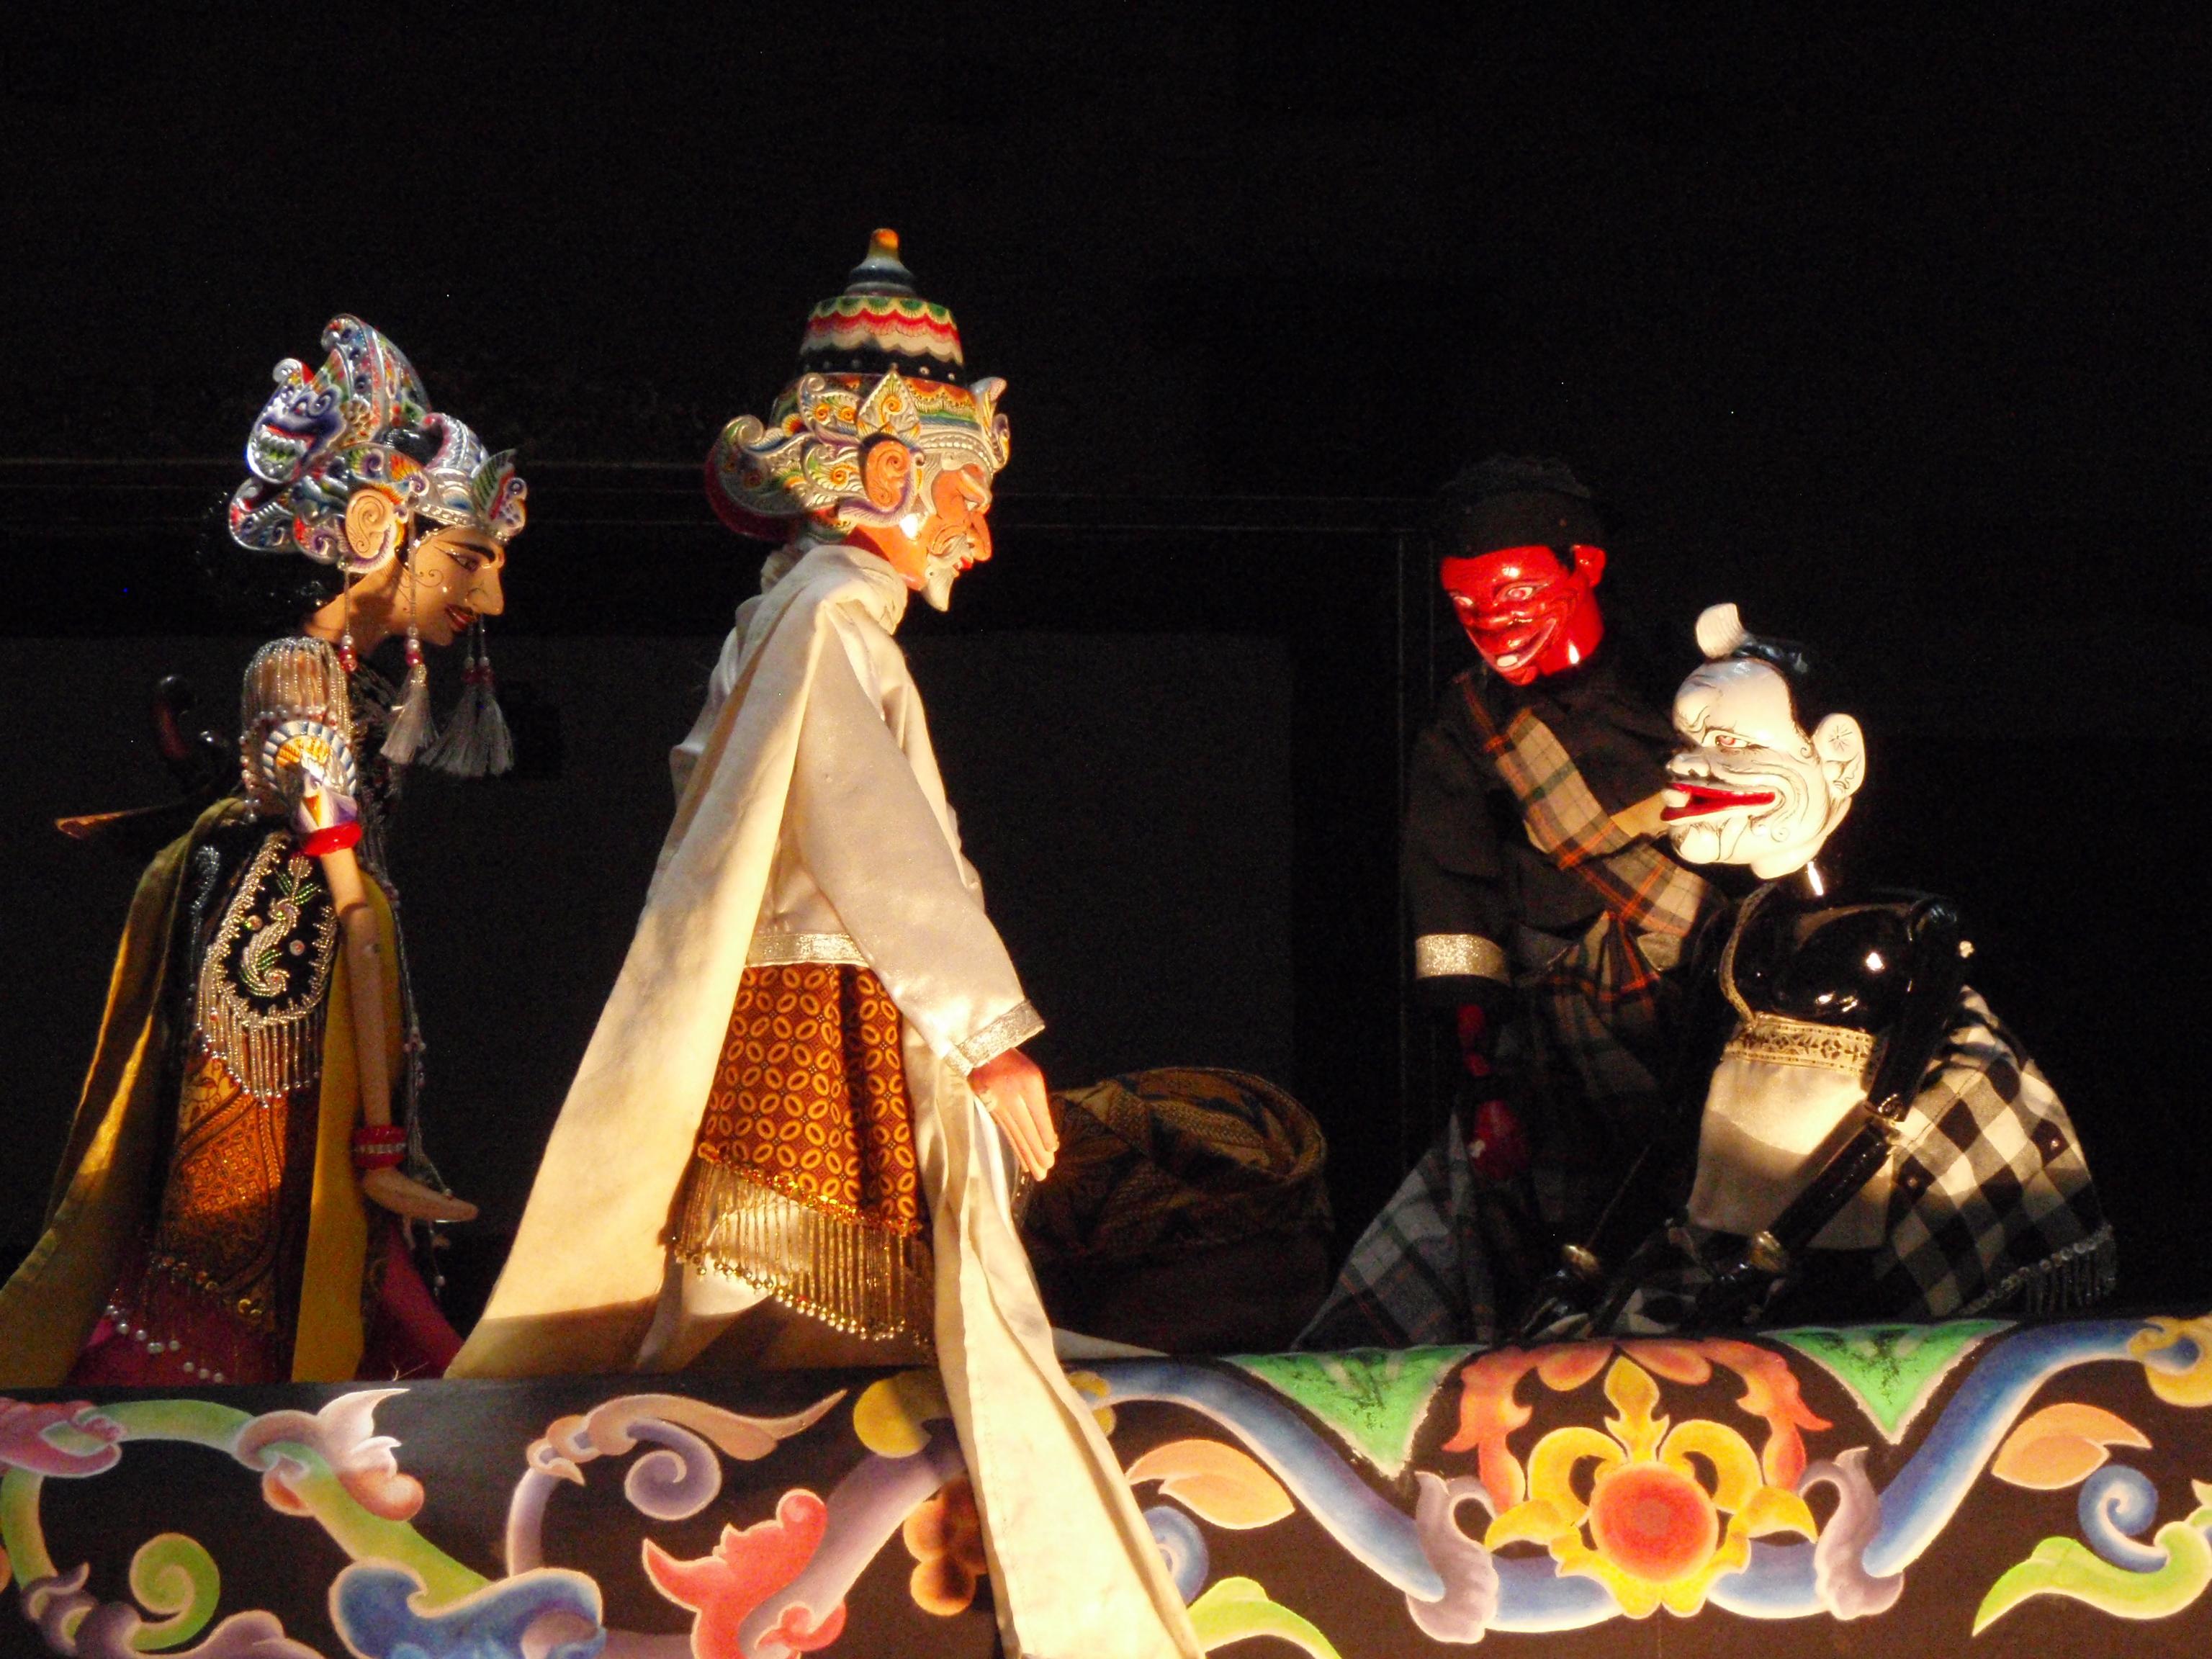 <em>Wayang golek purwa Bandung</em>. Marionnettes à tiges.